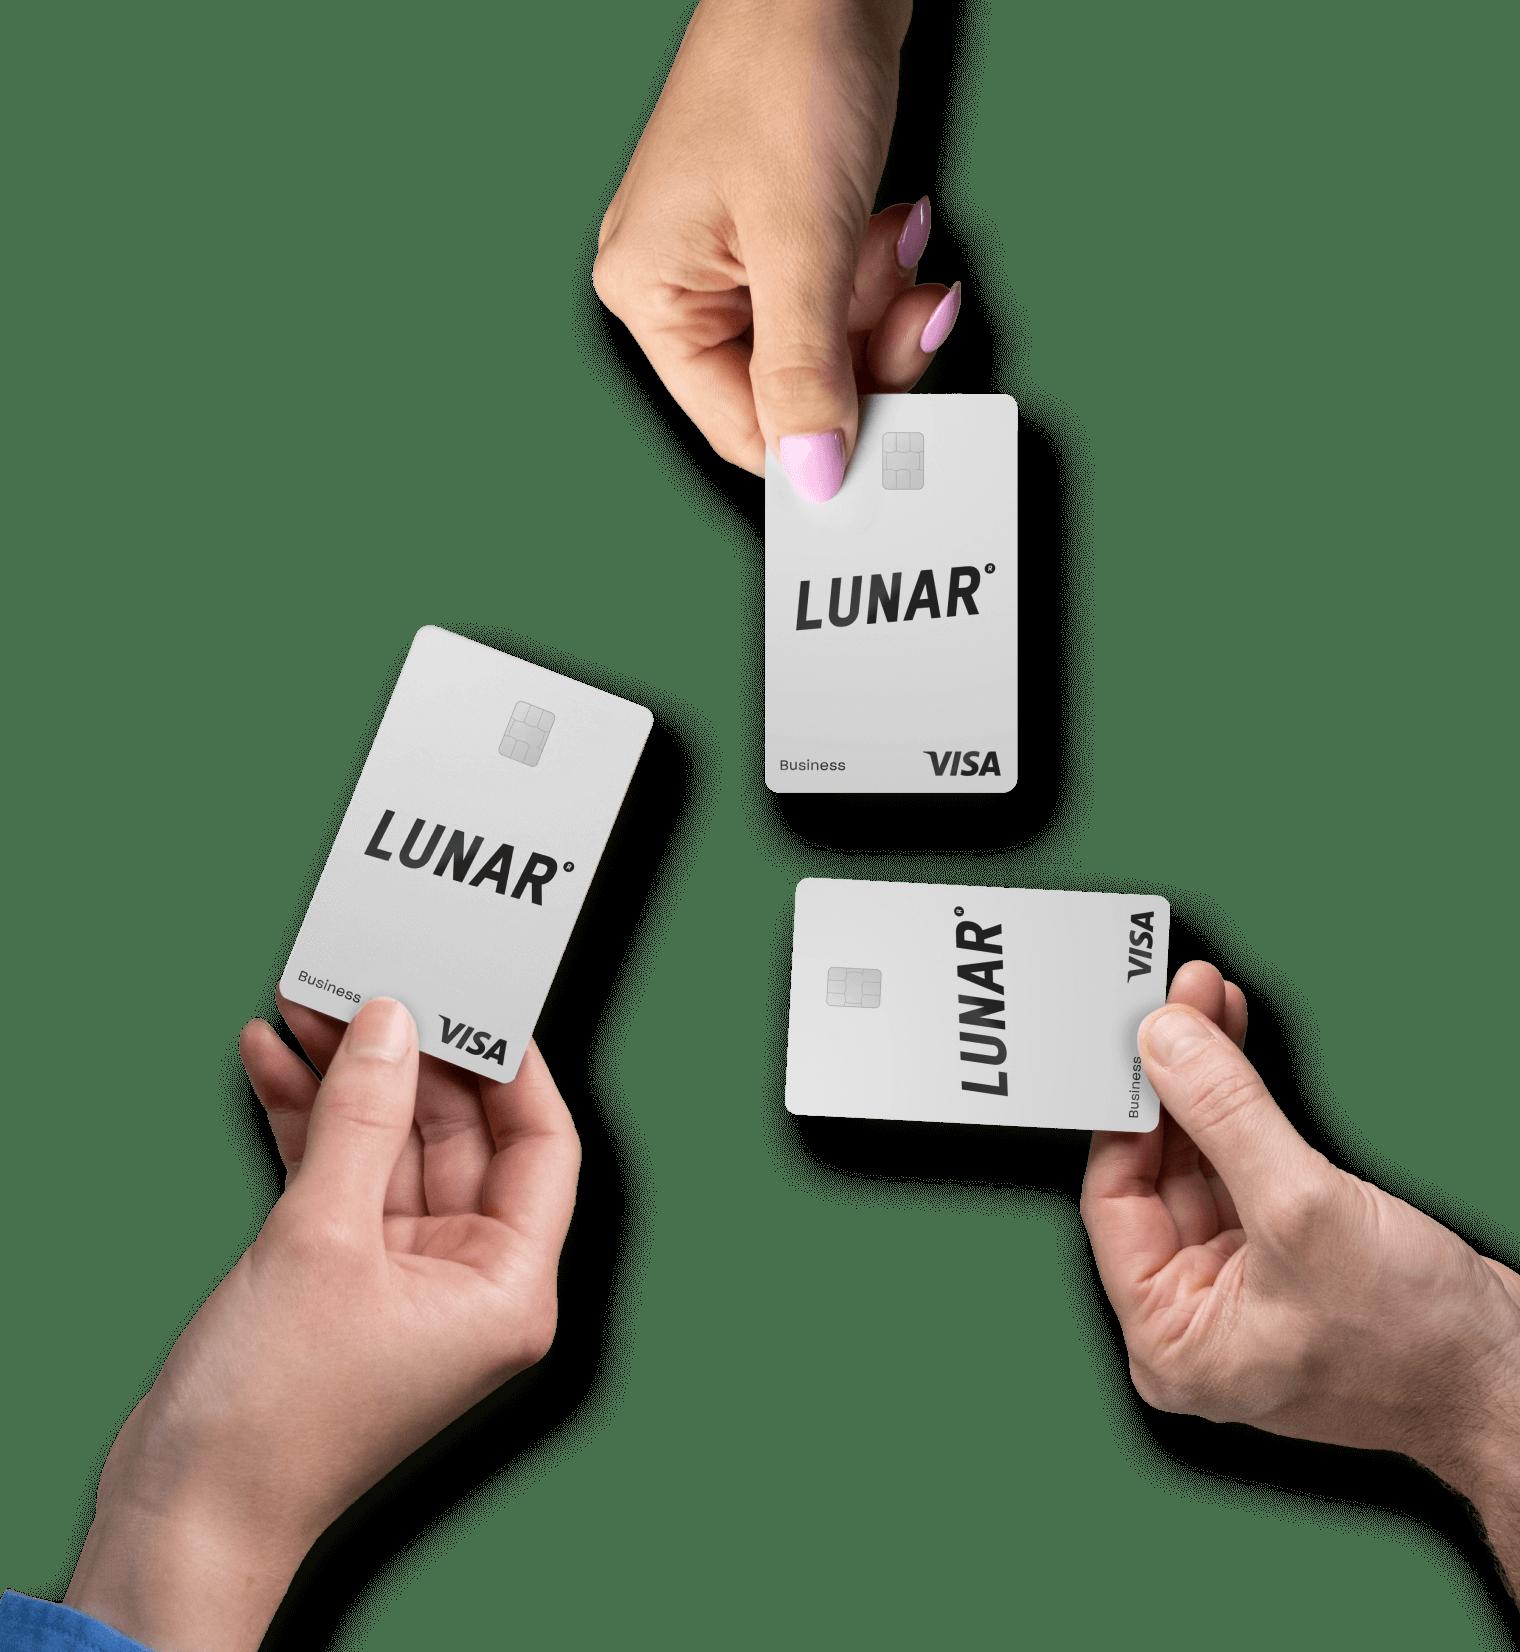 Lunar Business company card